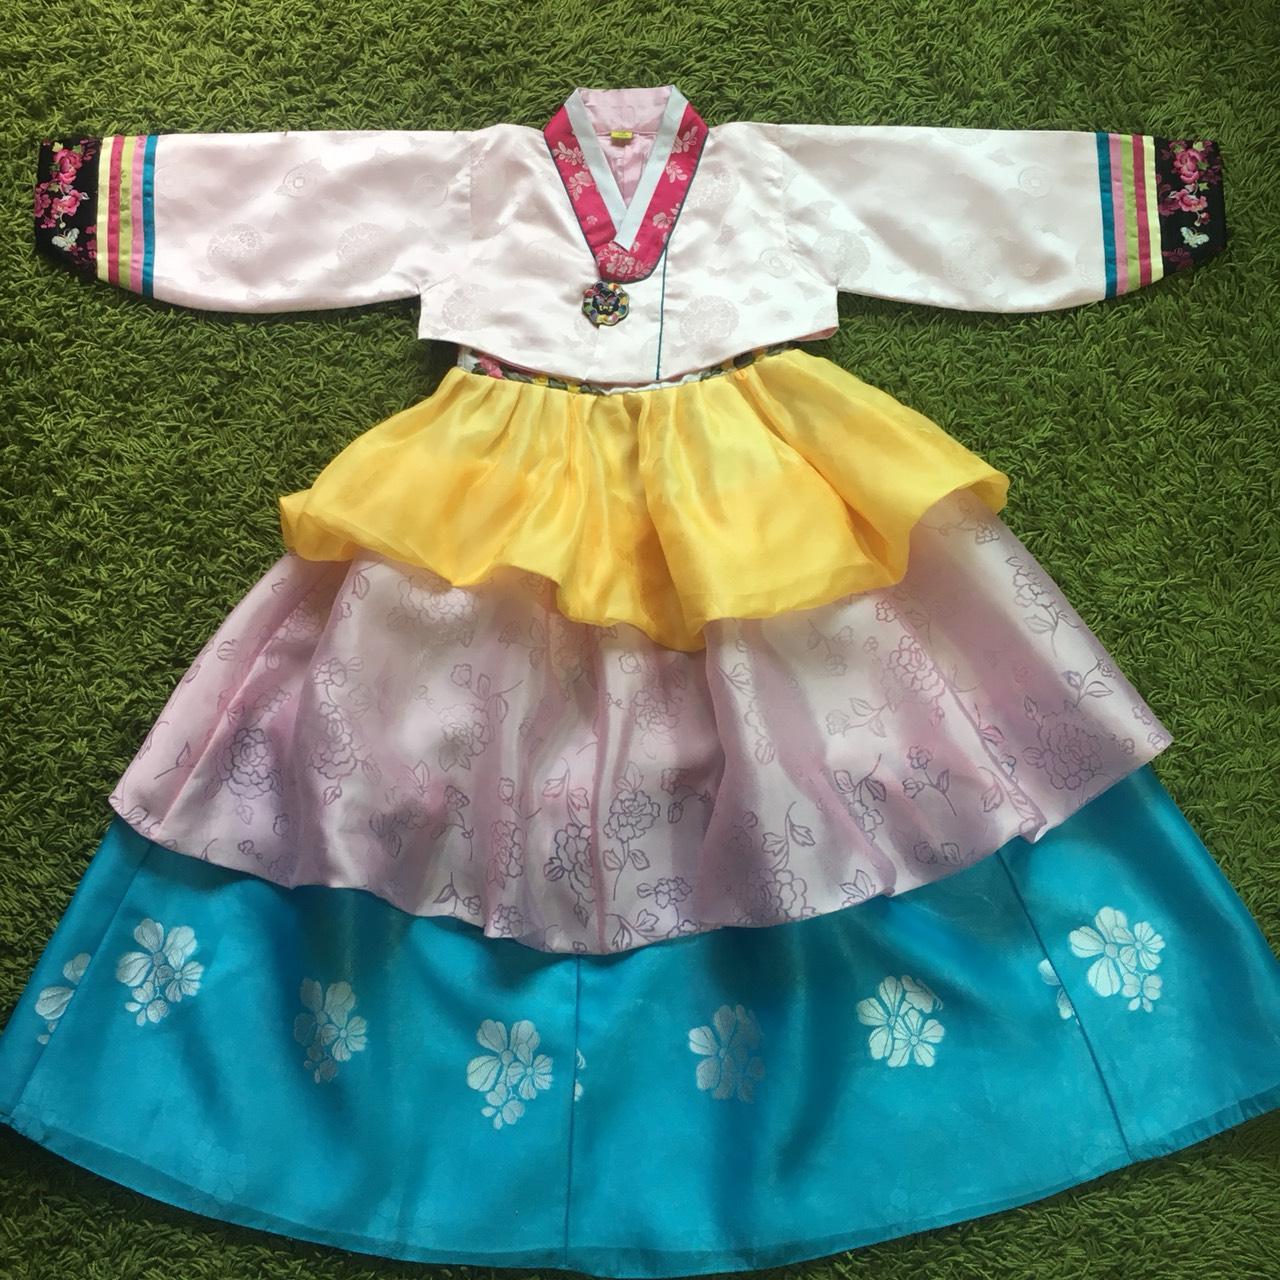 Hanbok Girl ฮันบกสีลูกกวาด สำหรับเด็ก 7 ขวบ